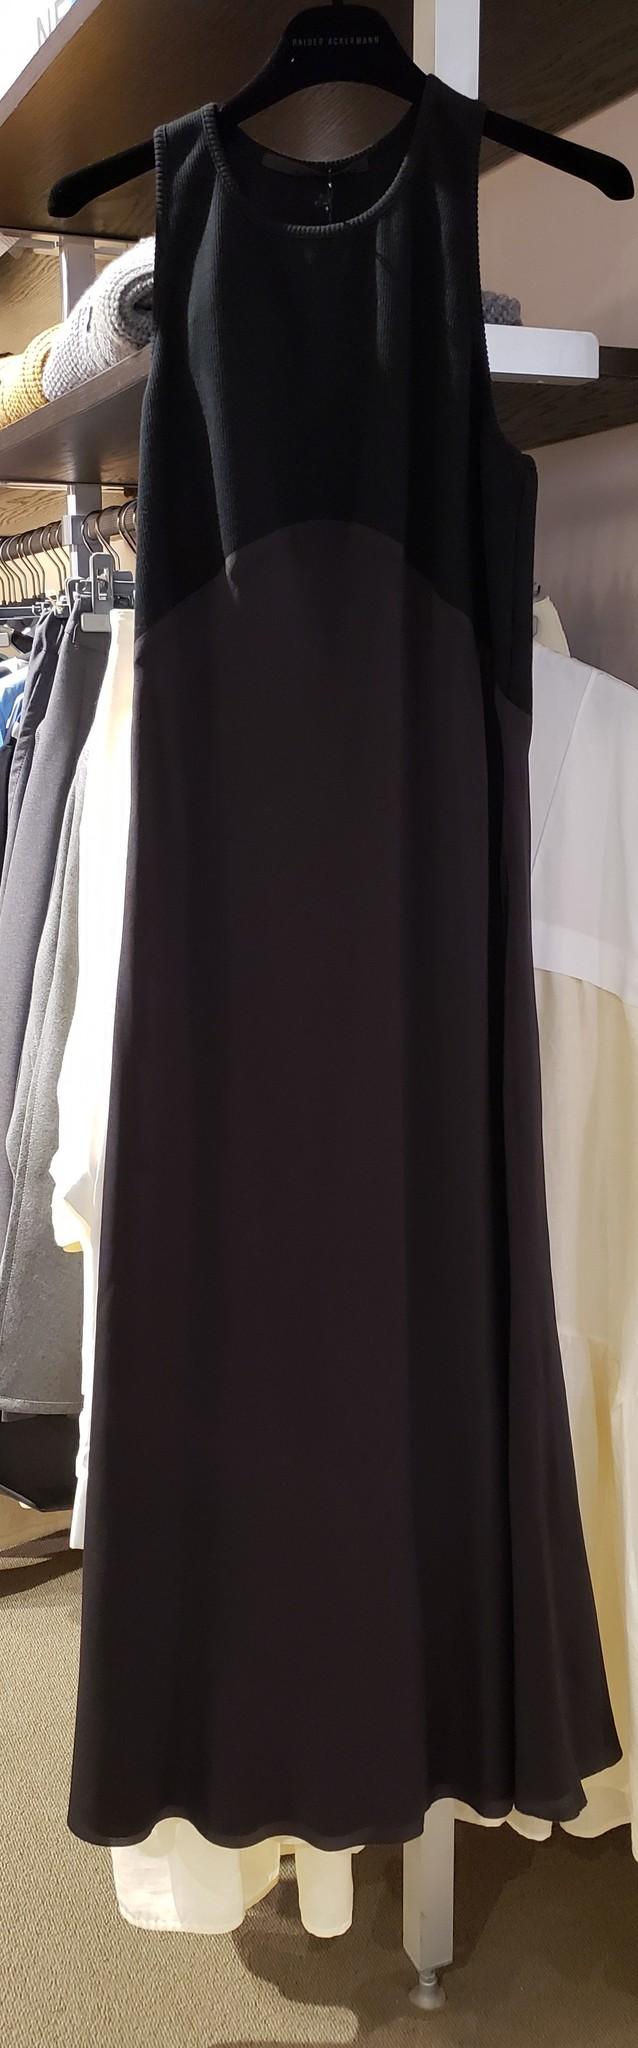 Dress - Black - Sz. 42-1